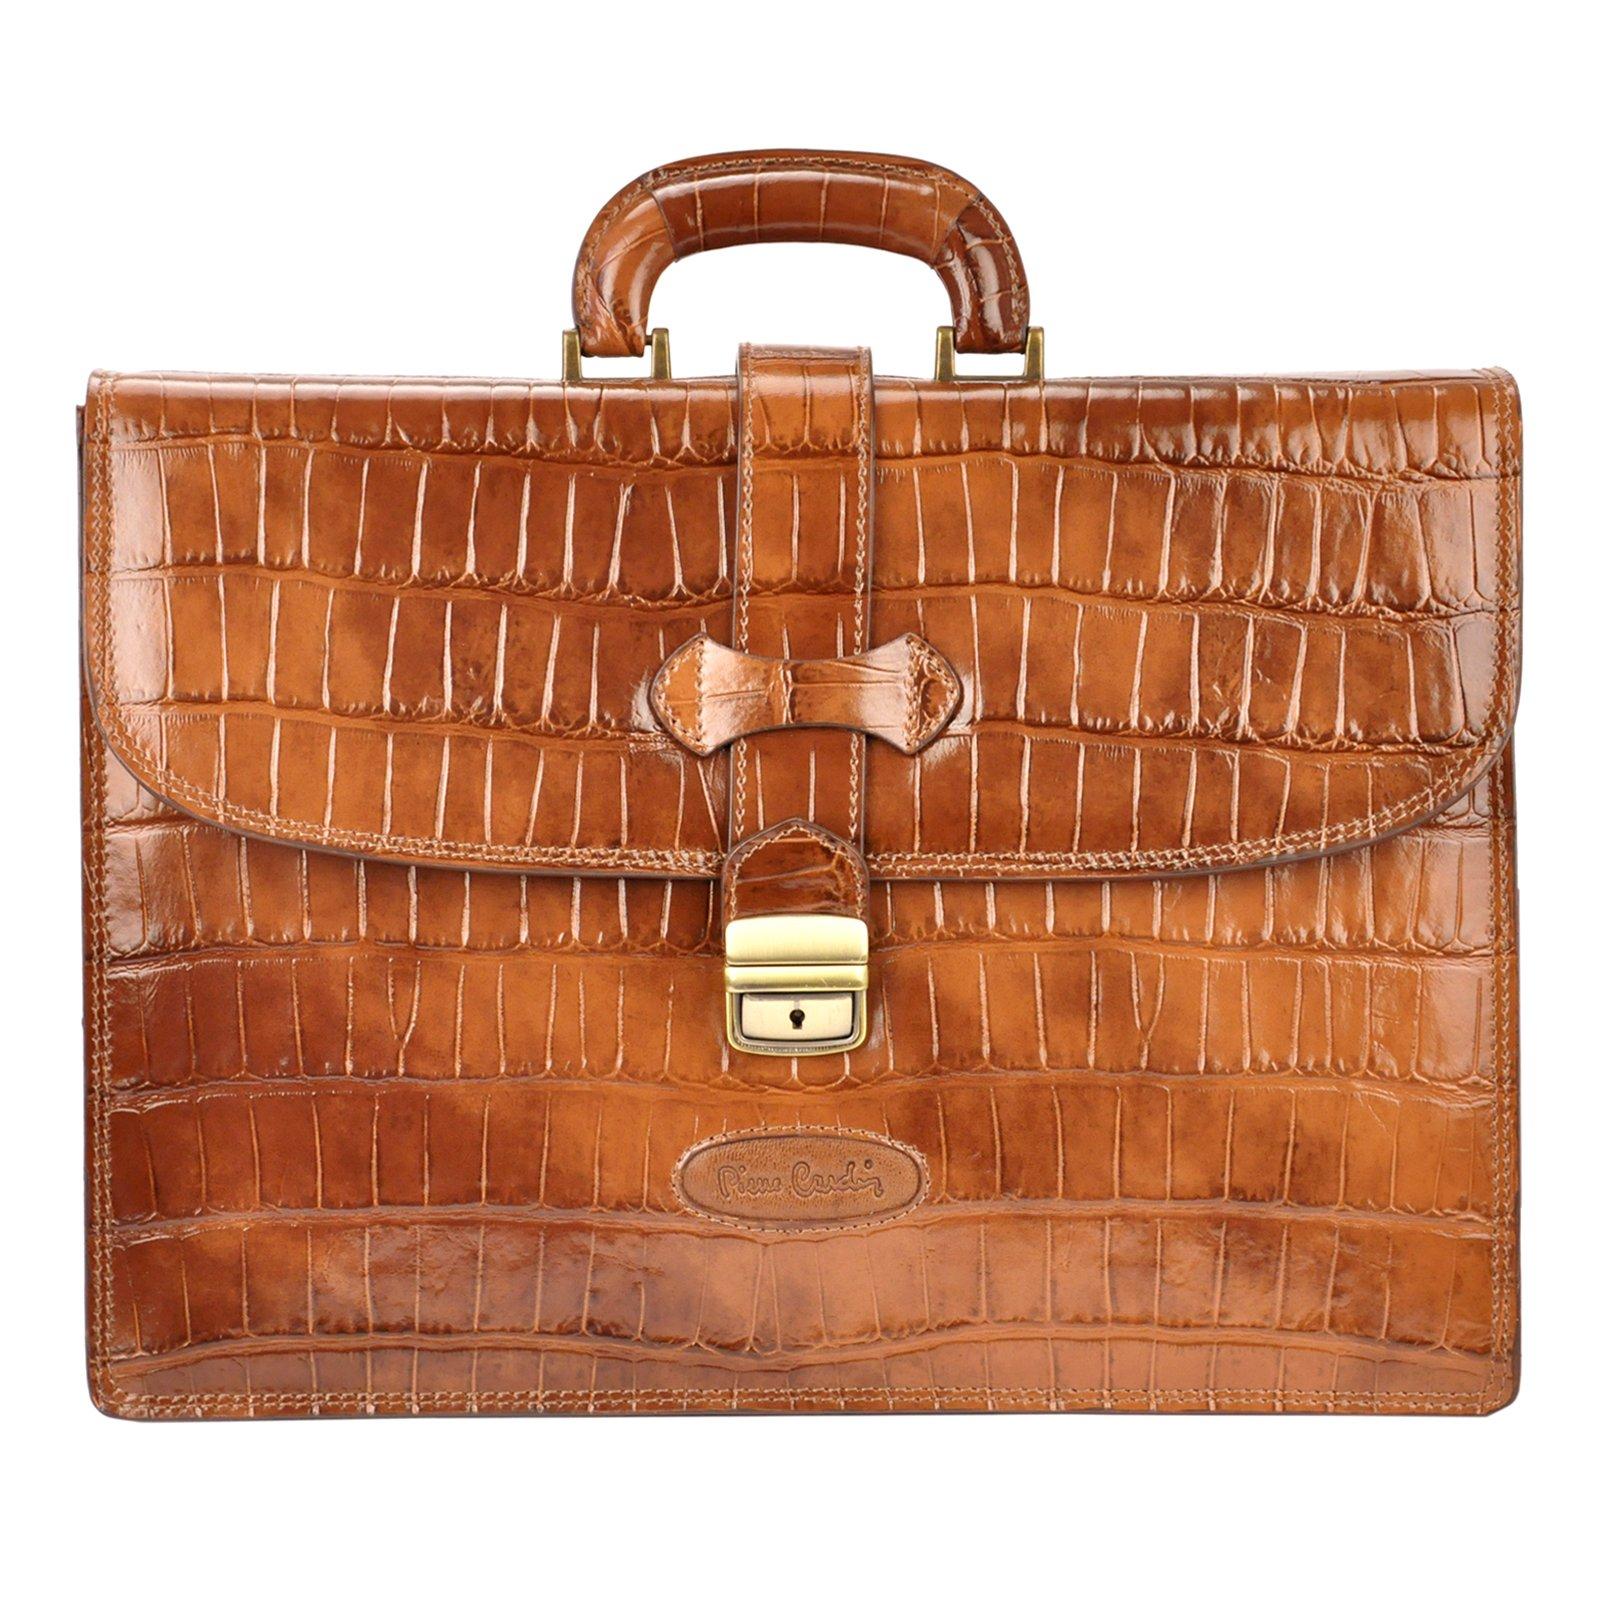 Luxusná aktovka Pierre Cardin 1015 RM02 COCCO